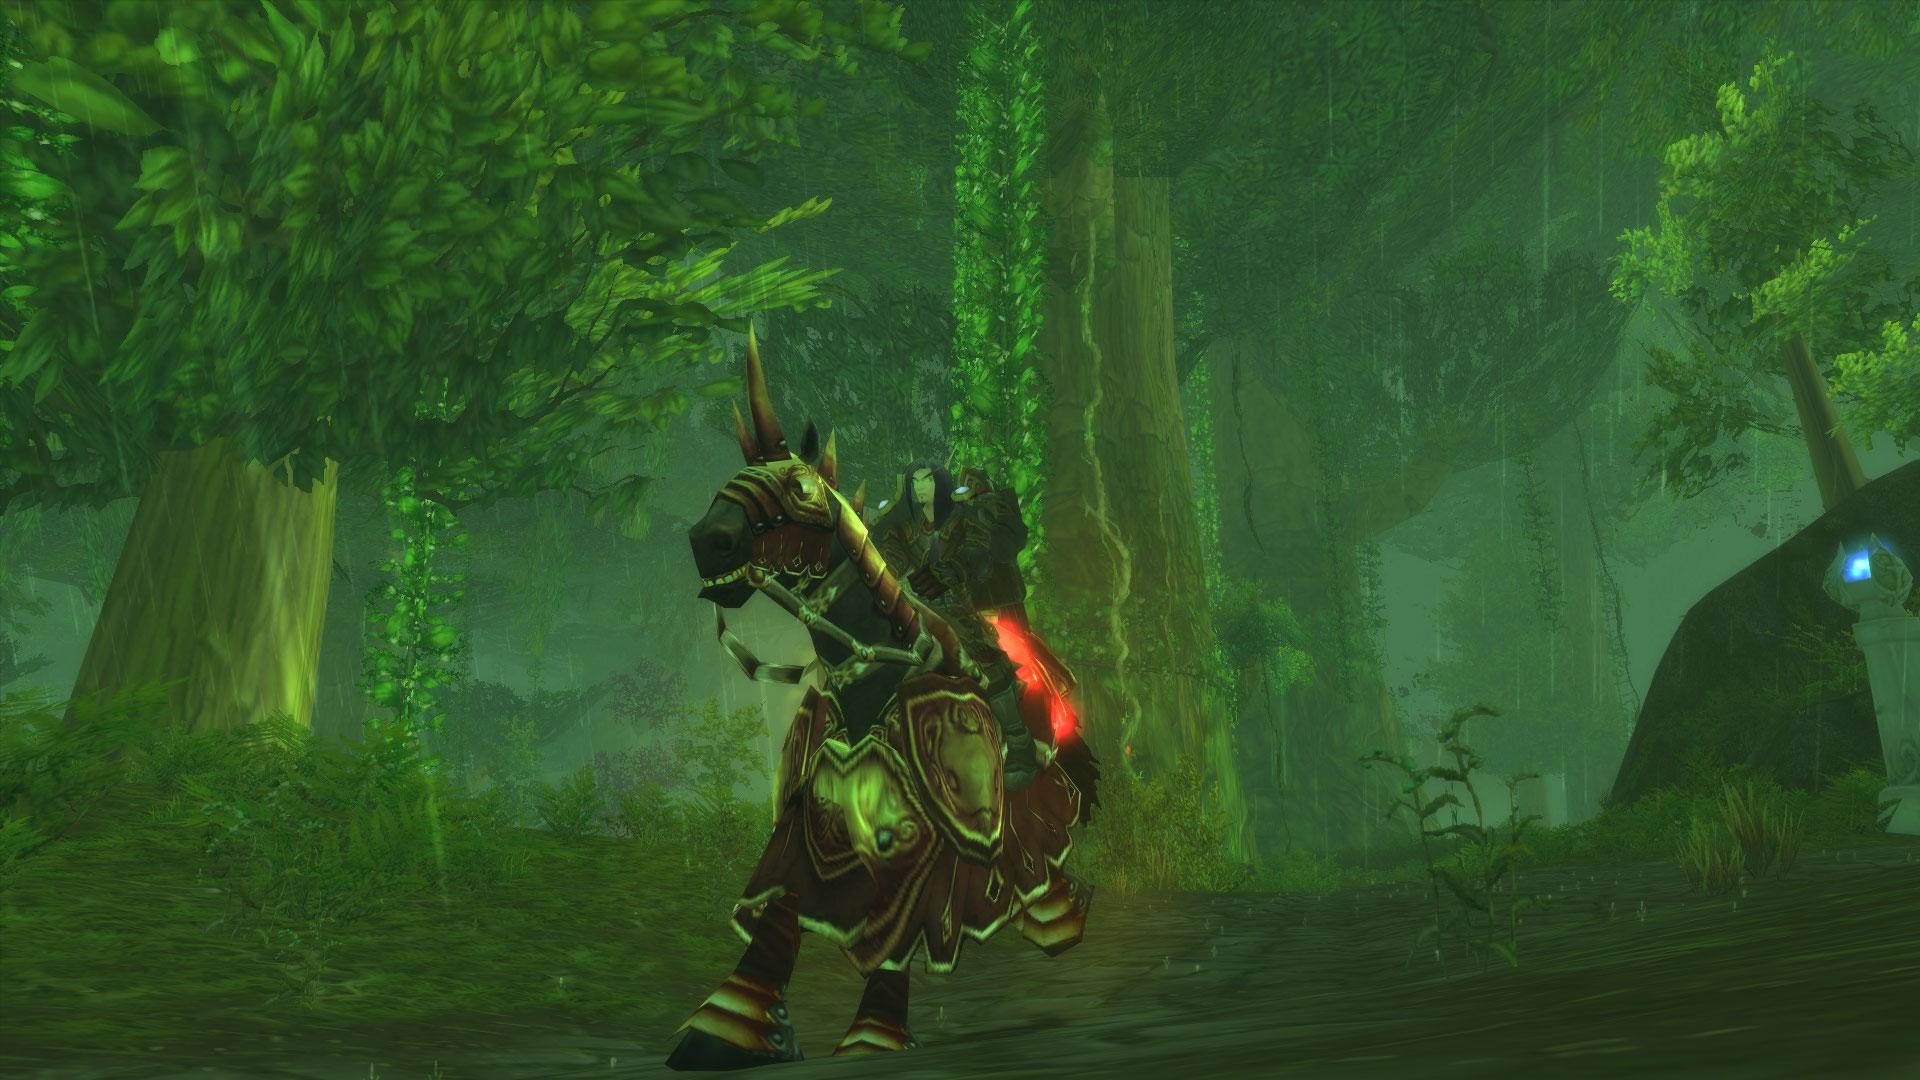 World of warcraft blood elf mount naked picture